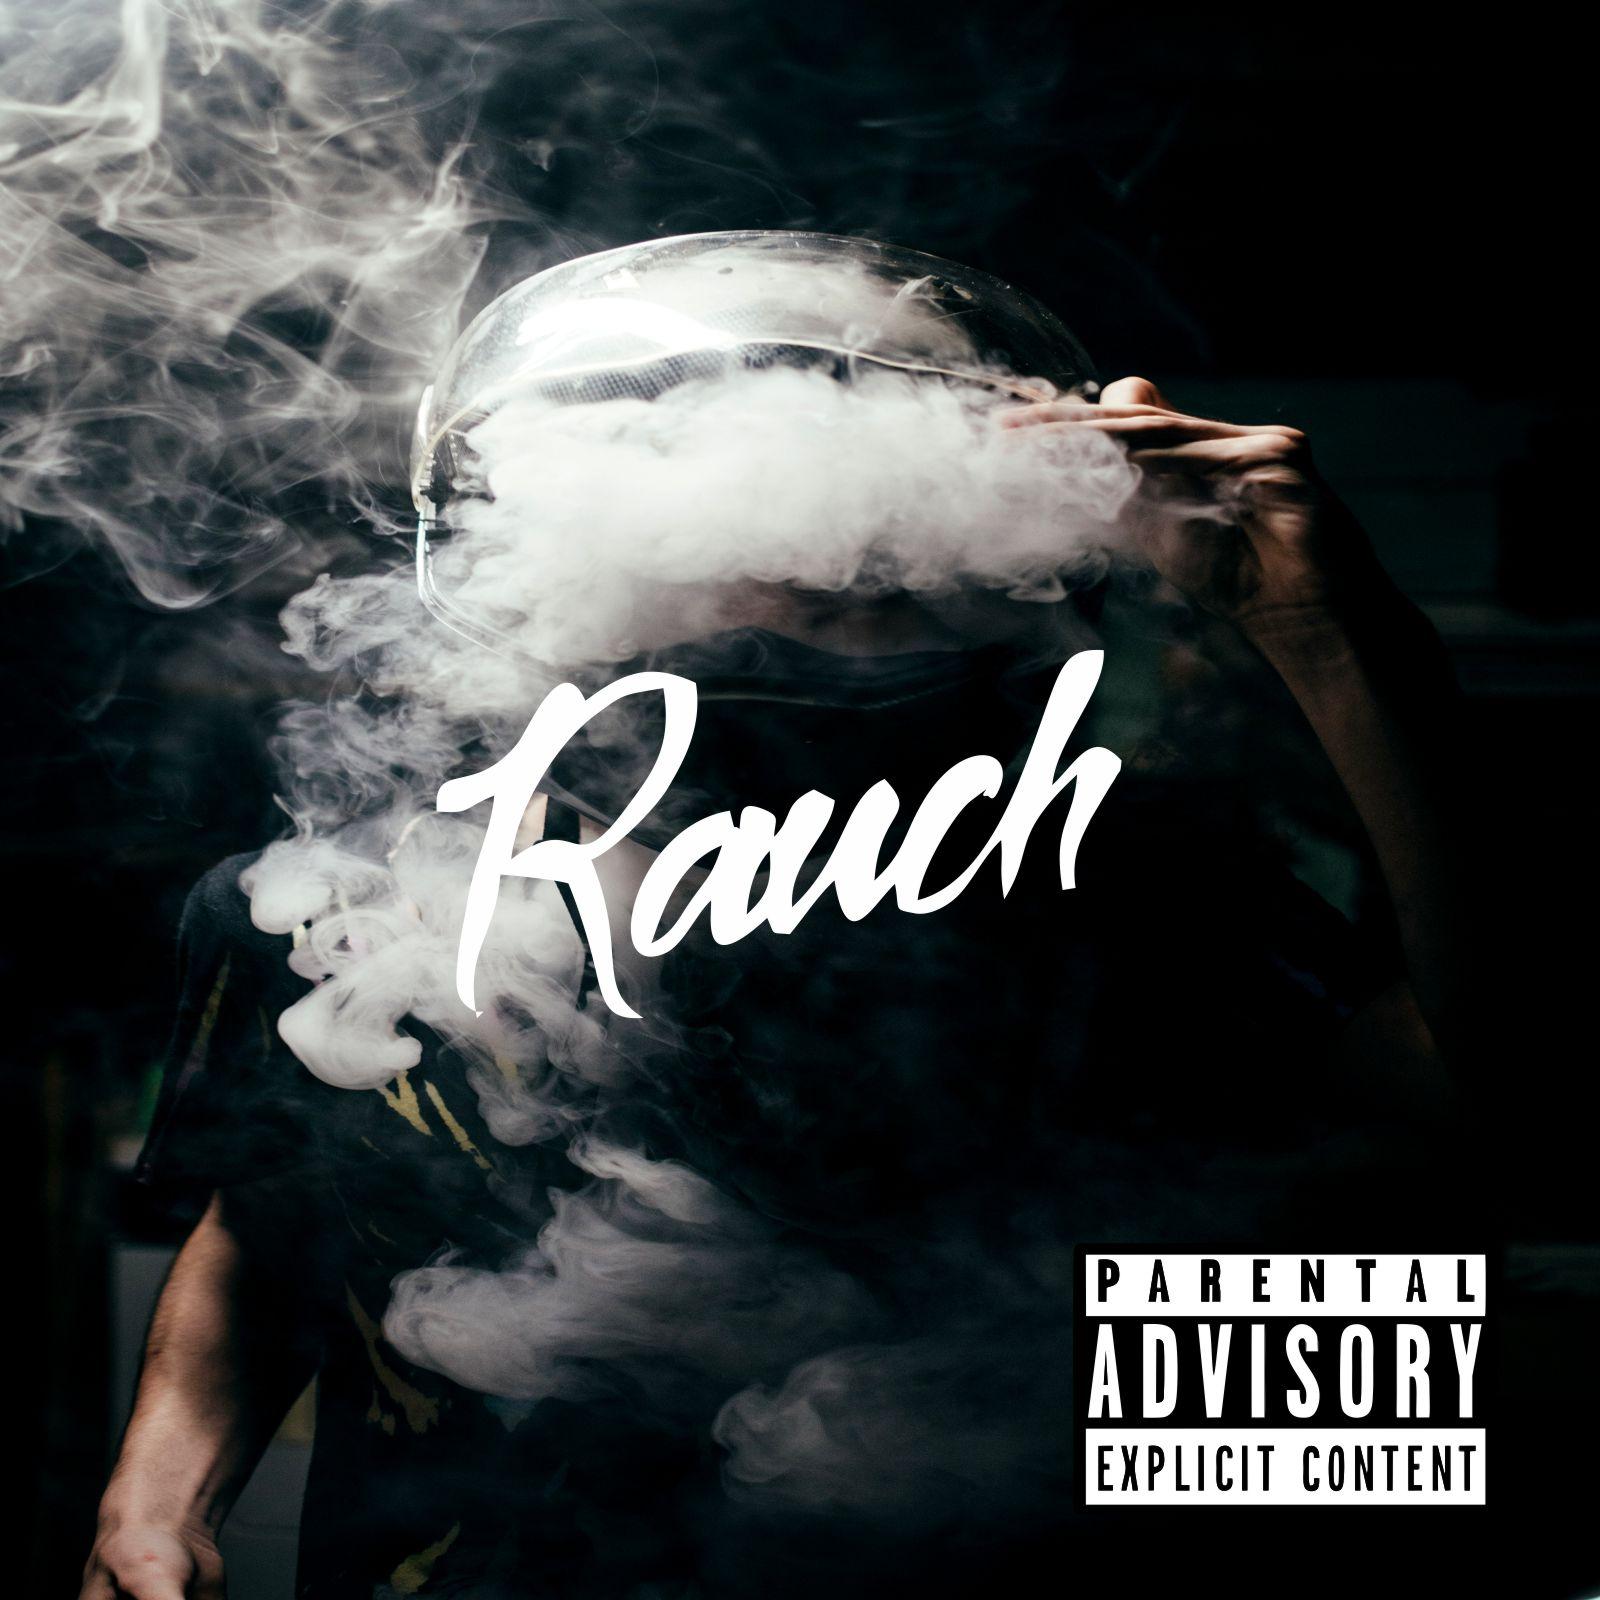 Upcoming: Yang Geesys - Rauch (FREETRACK)